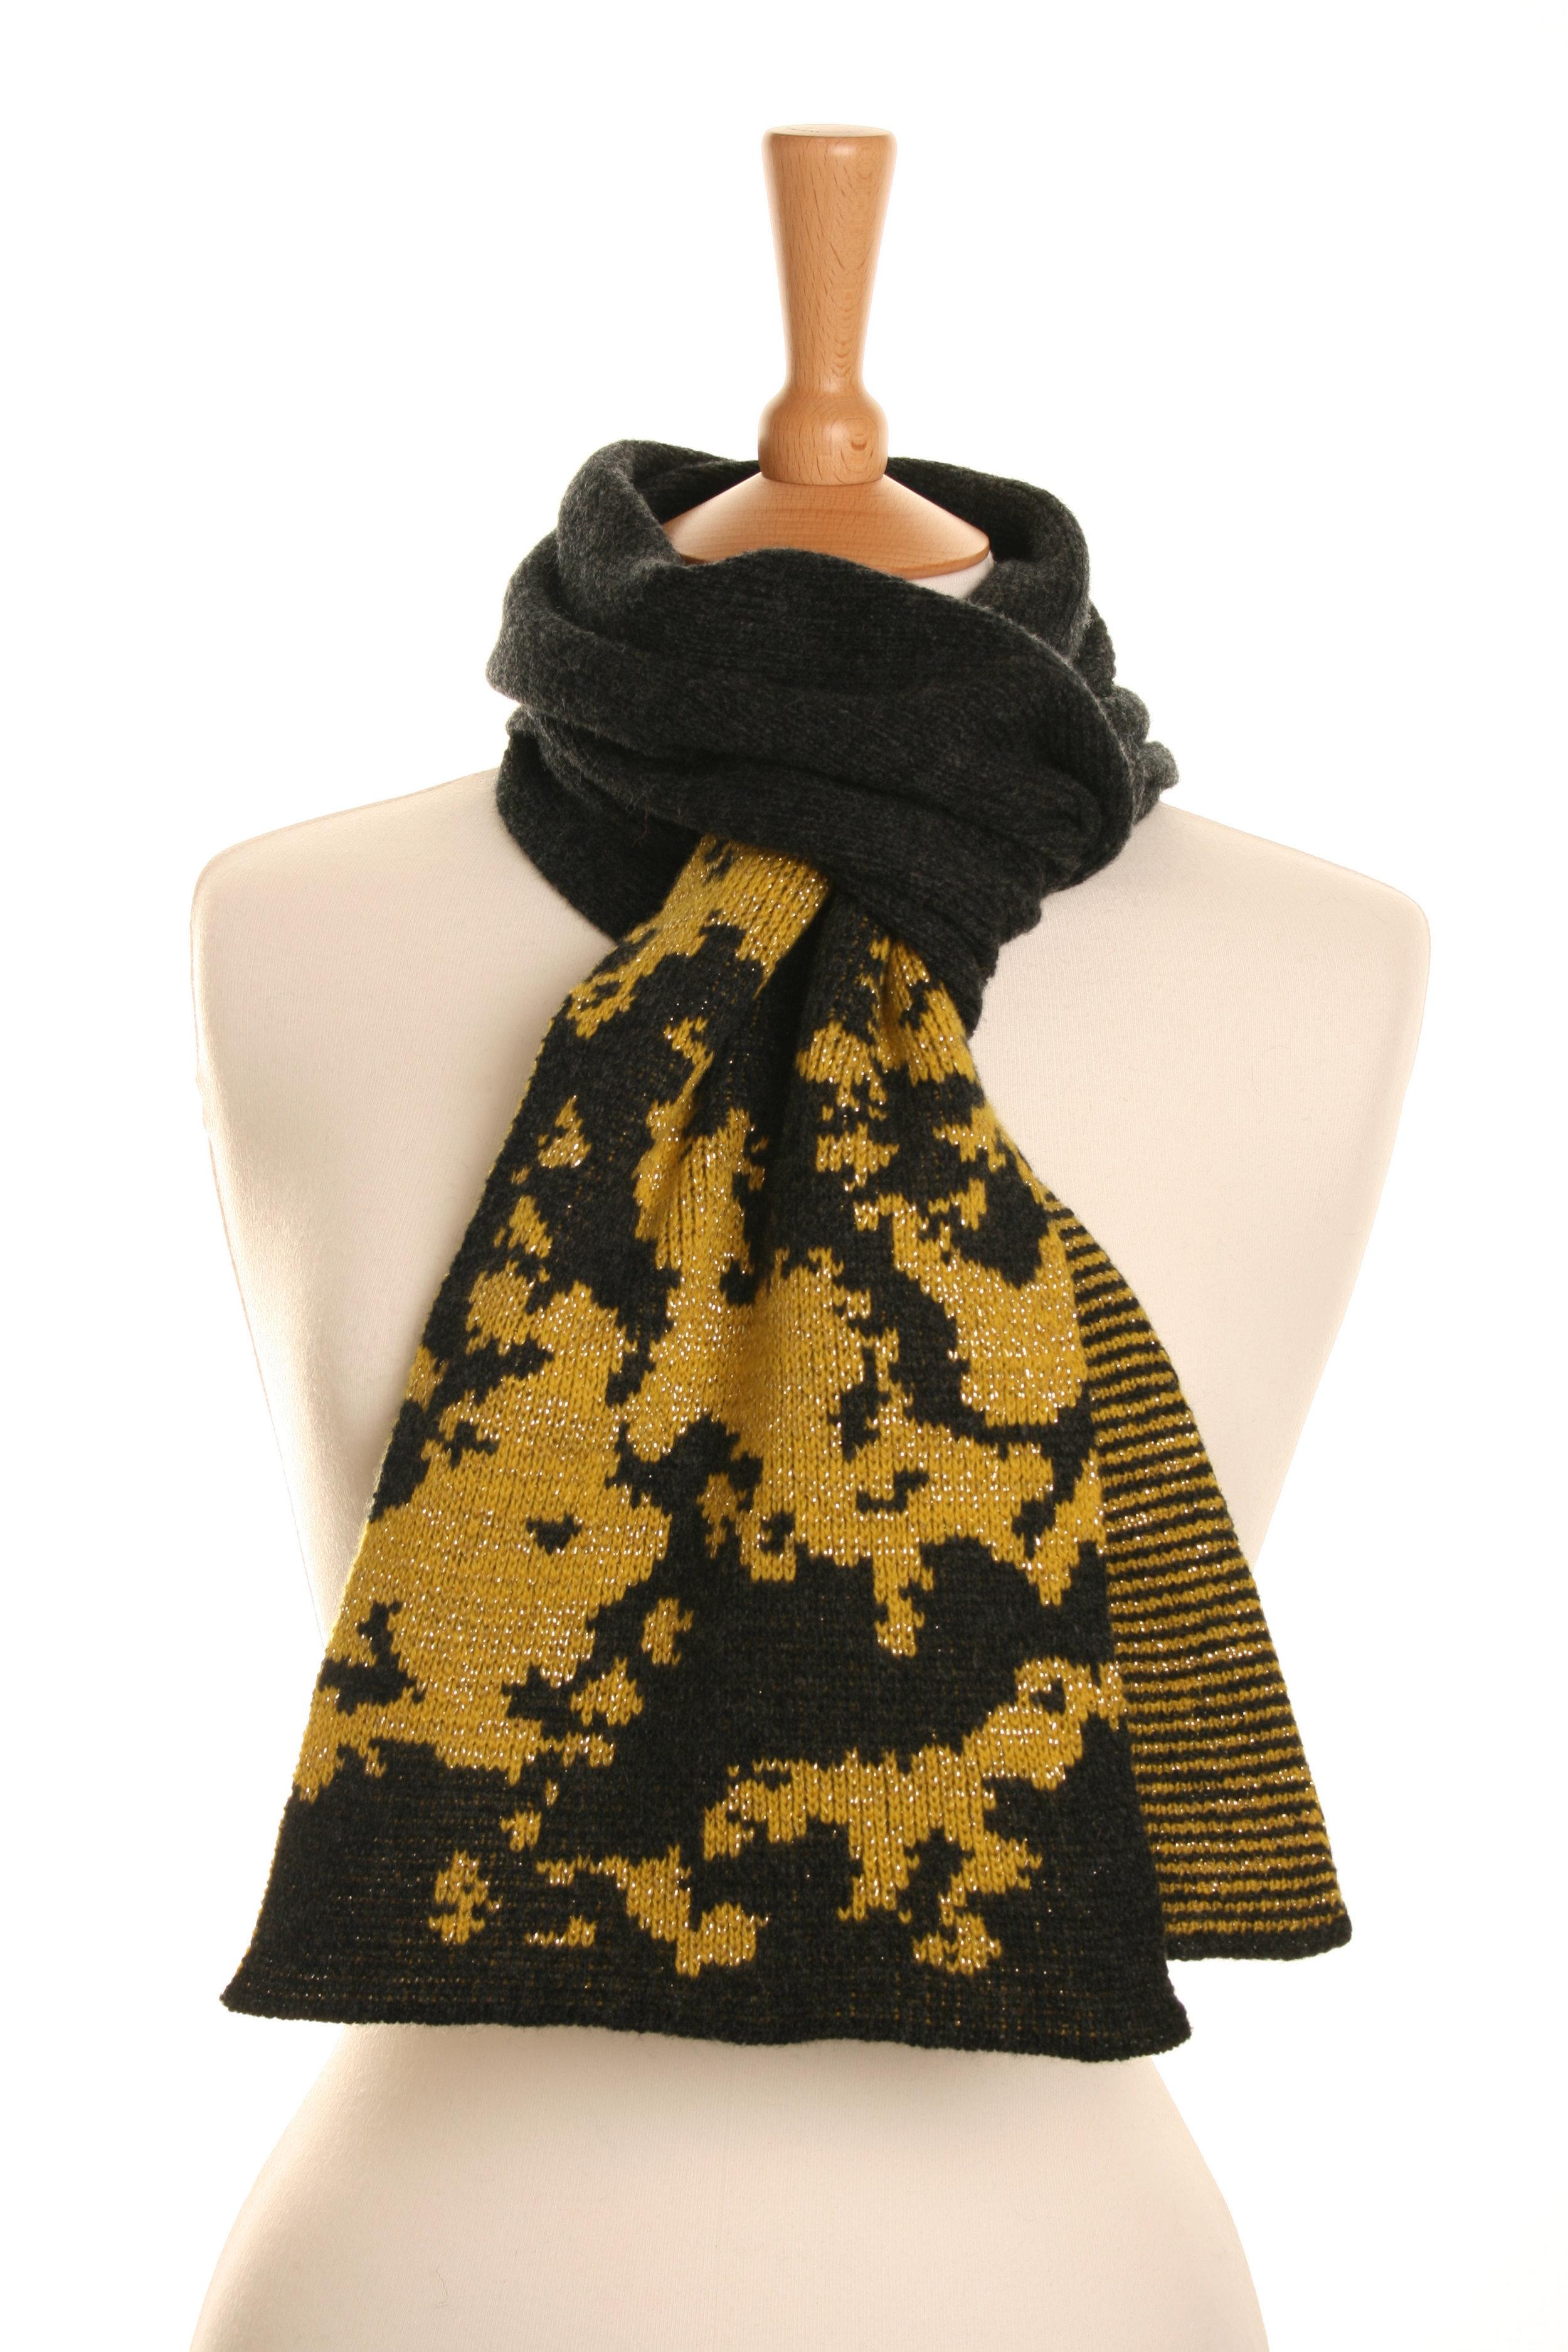 Picallili Lichen Sparkle  Knitted Lambswool  £75